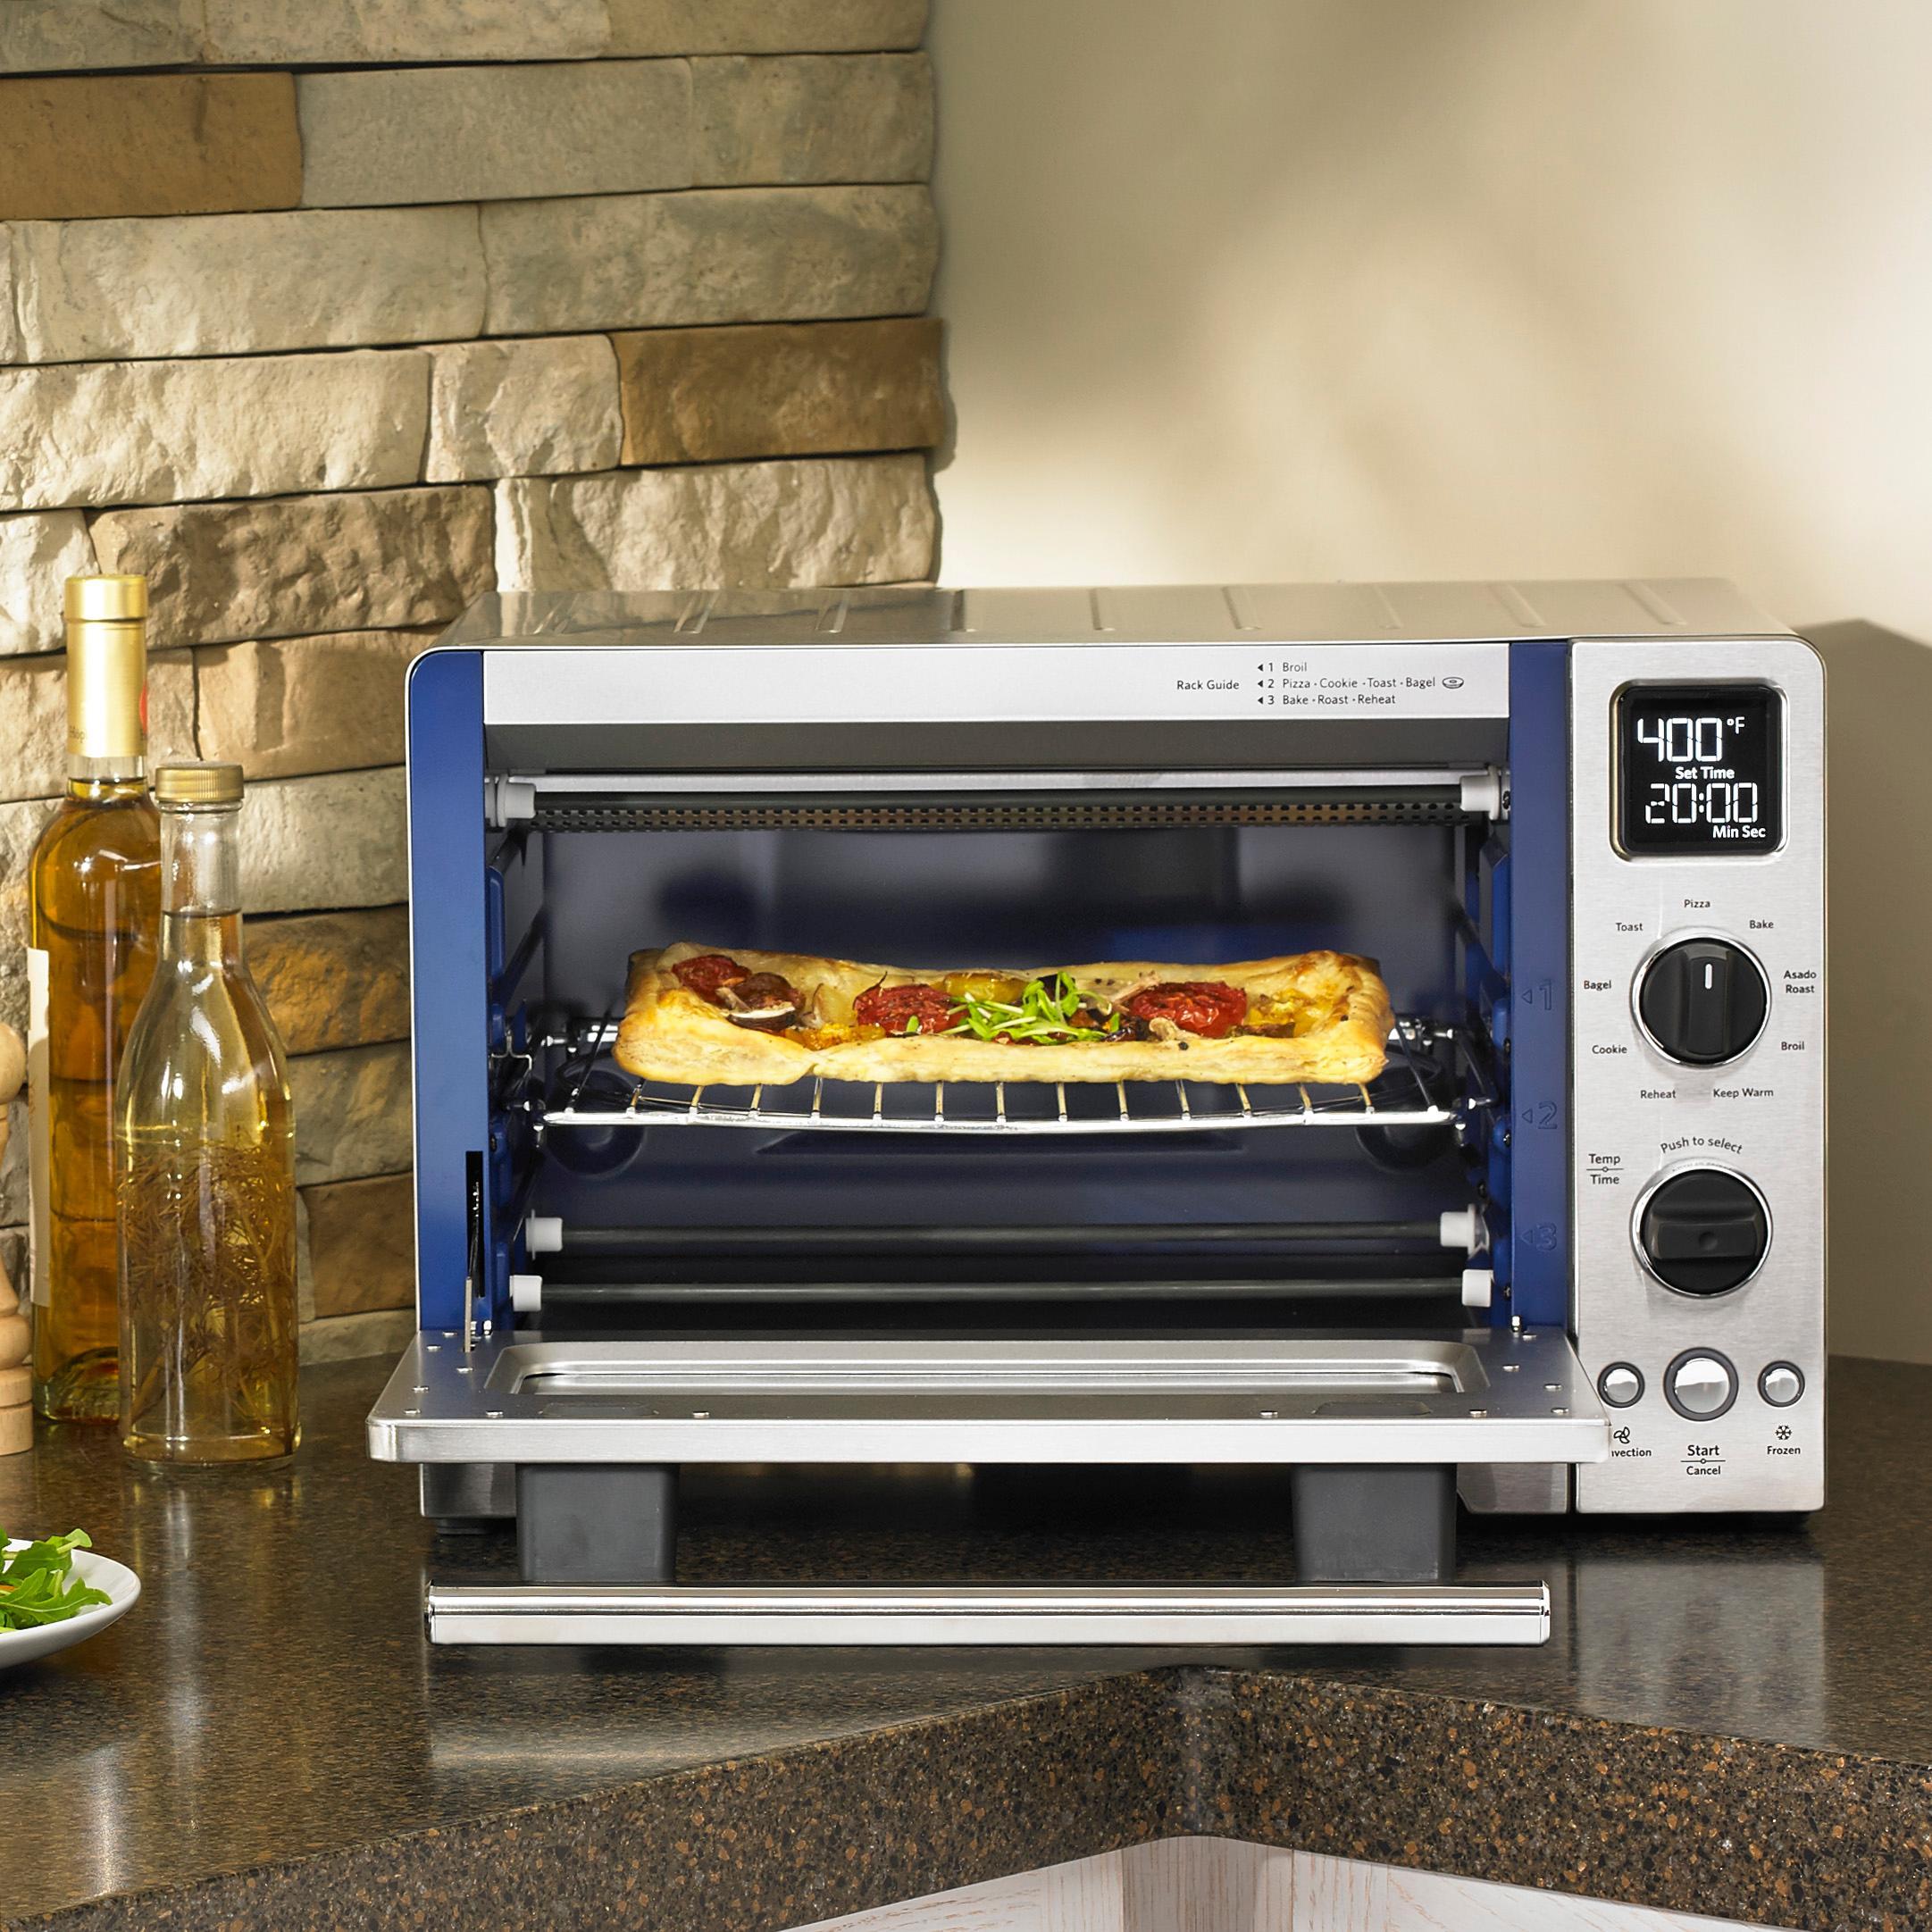 countertop extra spin reviews prod oster tssttvxldg hei qlt oven p large wid digital